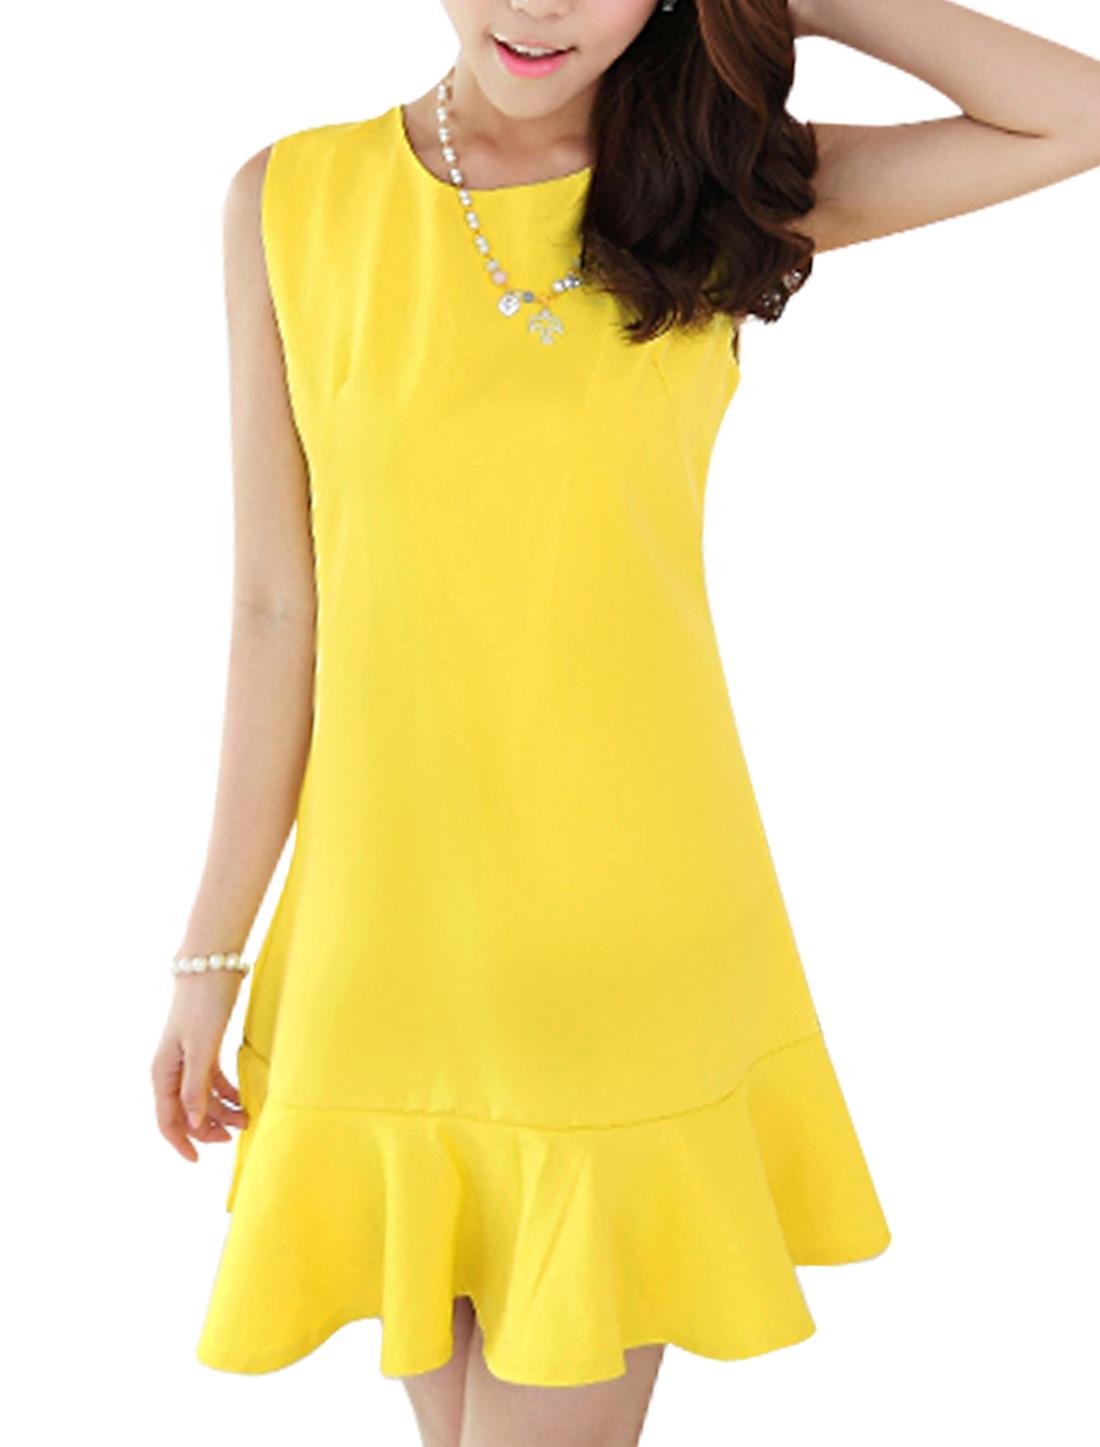 Ladies Slipover Round Neck Flouncing Hem Sweet Tank Dress Bright Yellow M